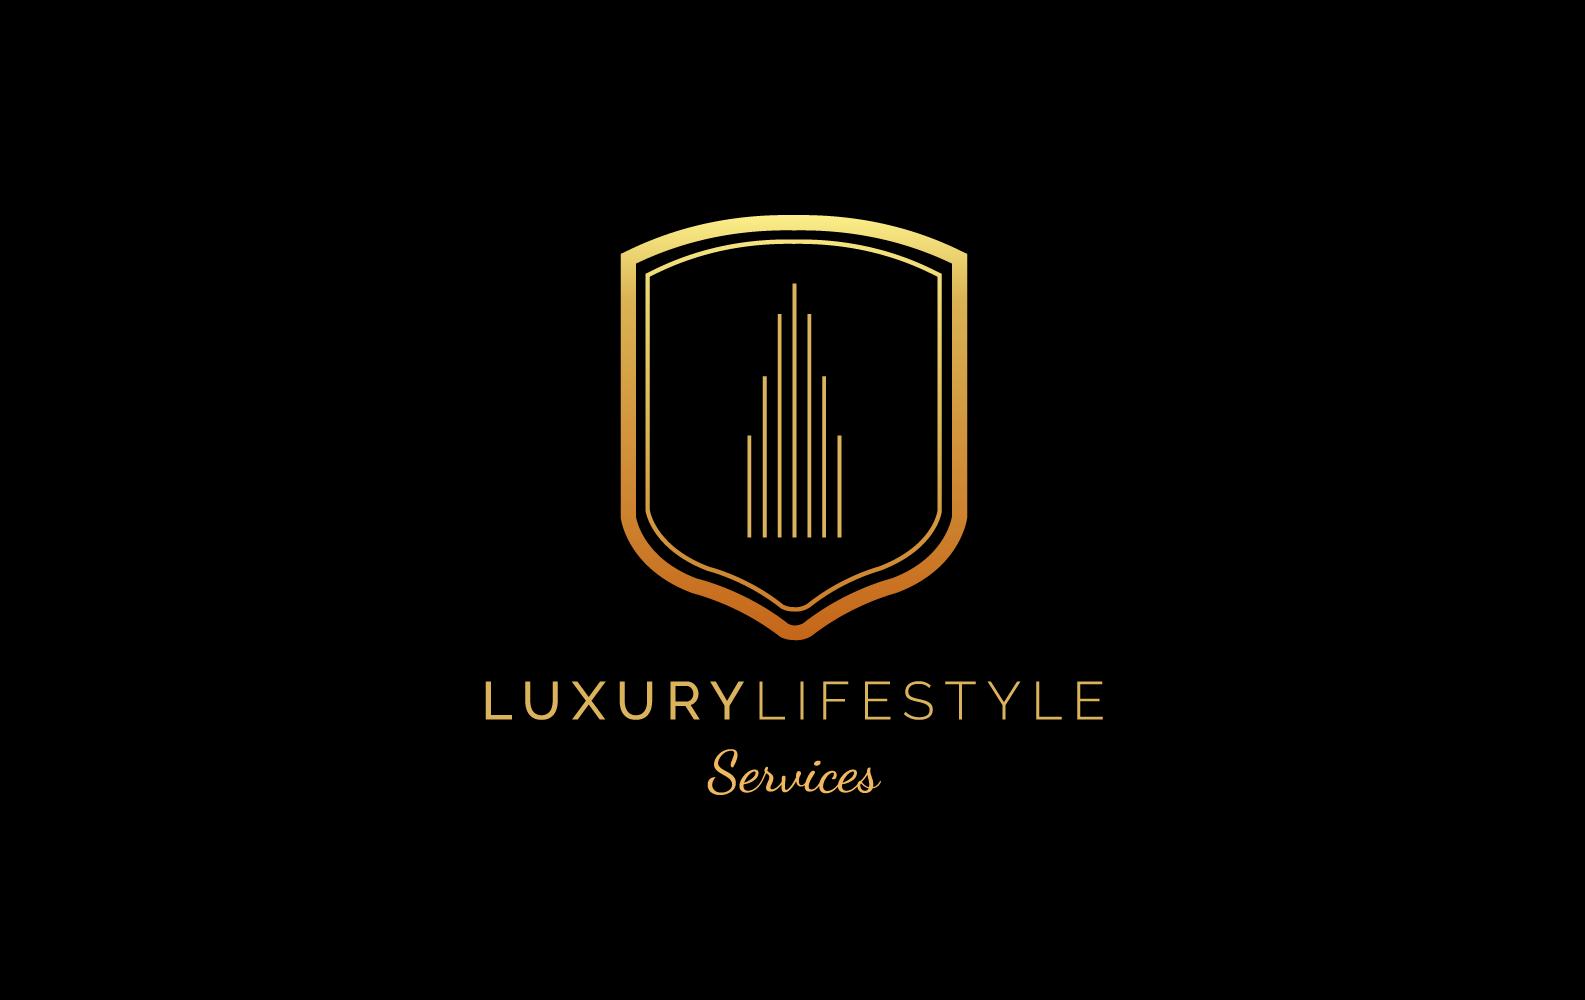 Luxury Lifestyle Services SL